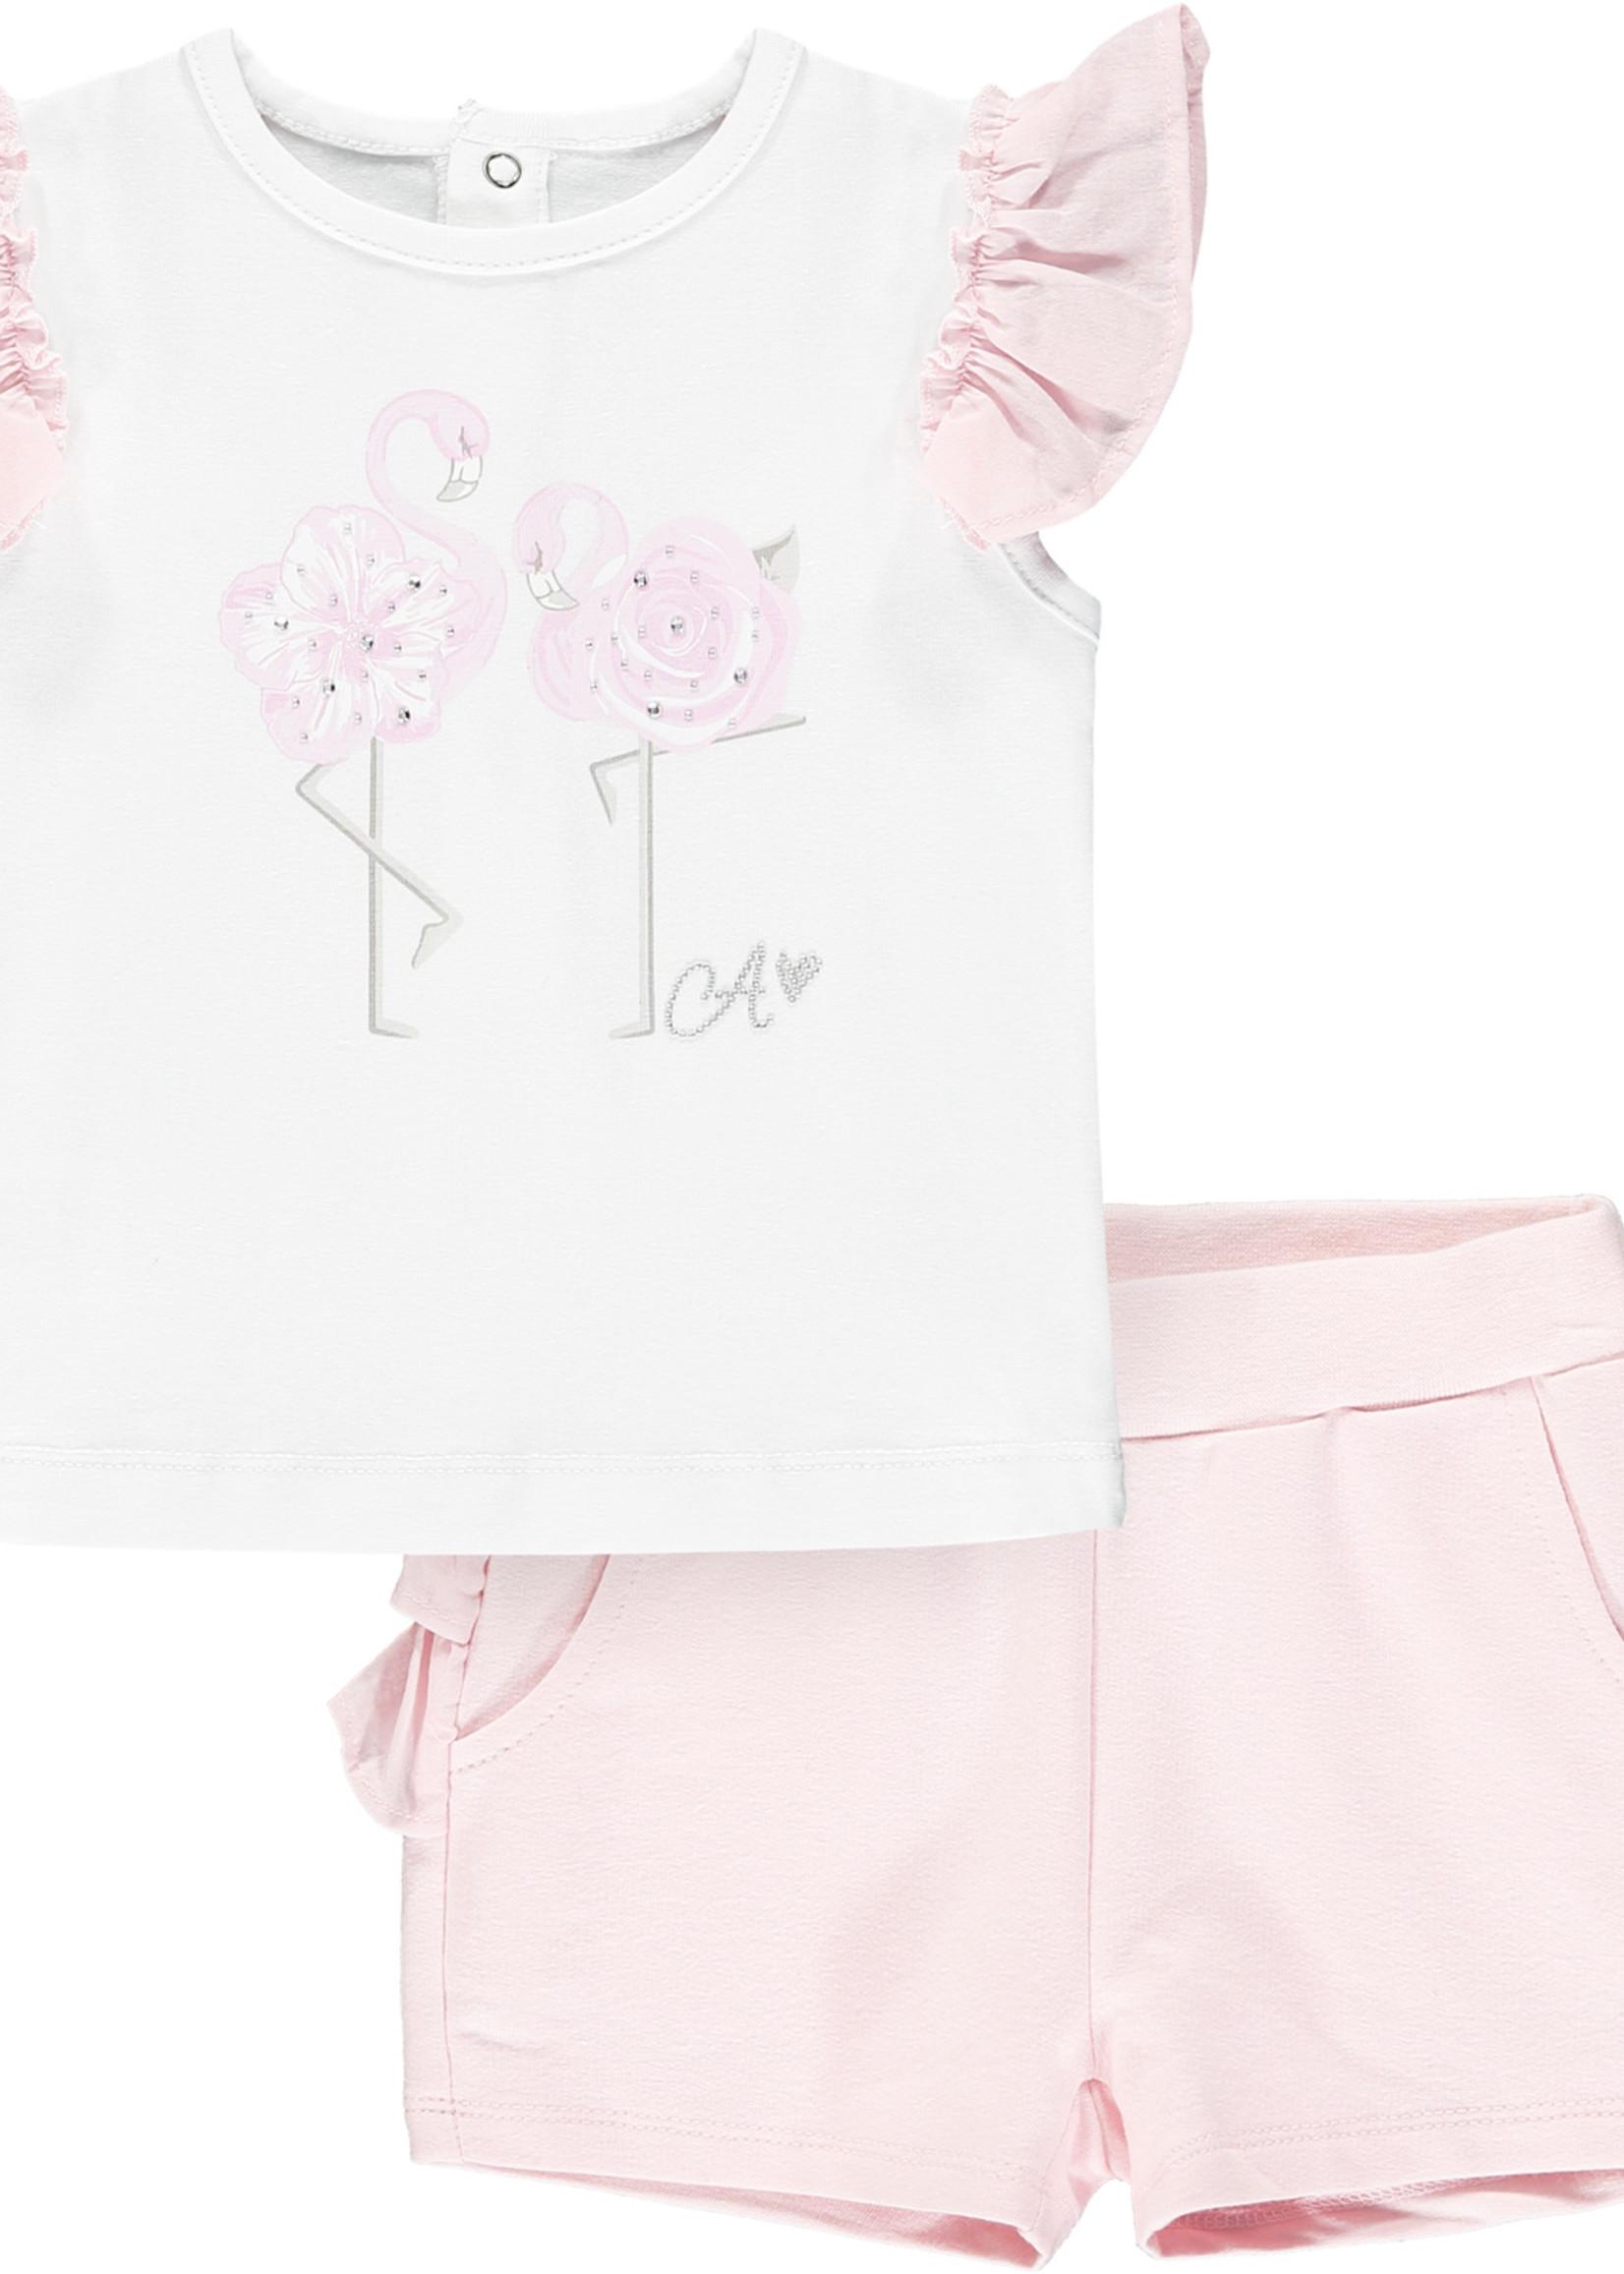 Little Adee Jagger Flamingo short set